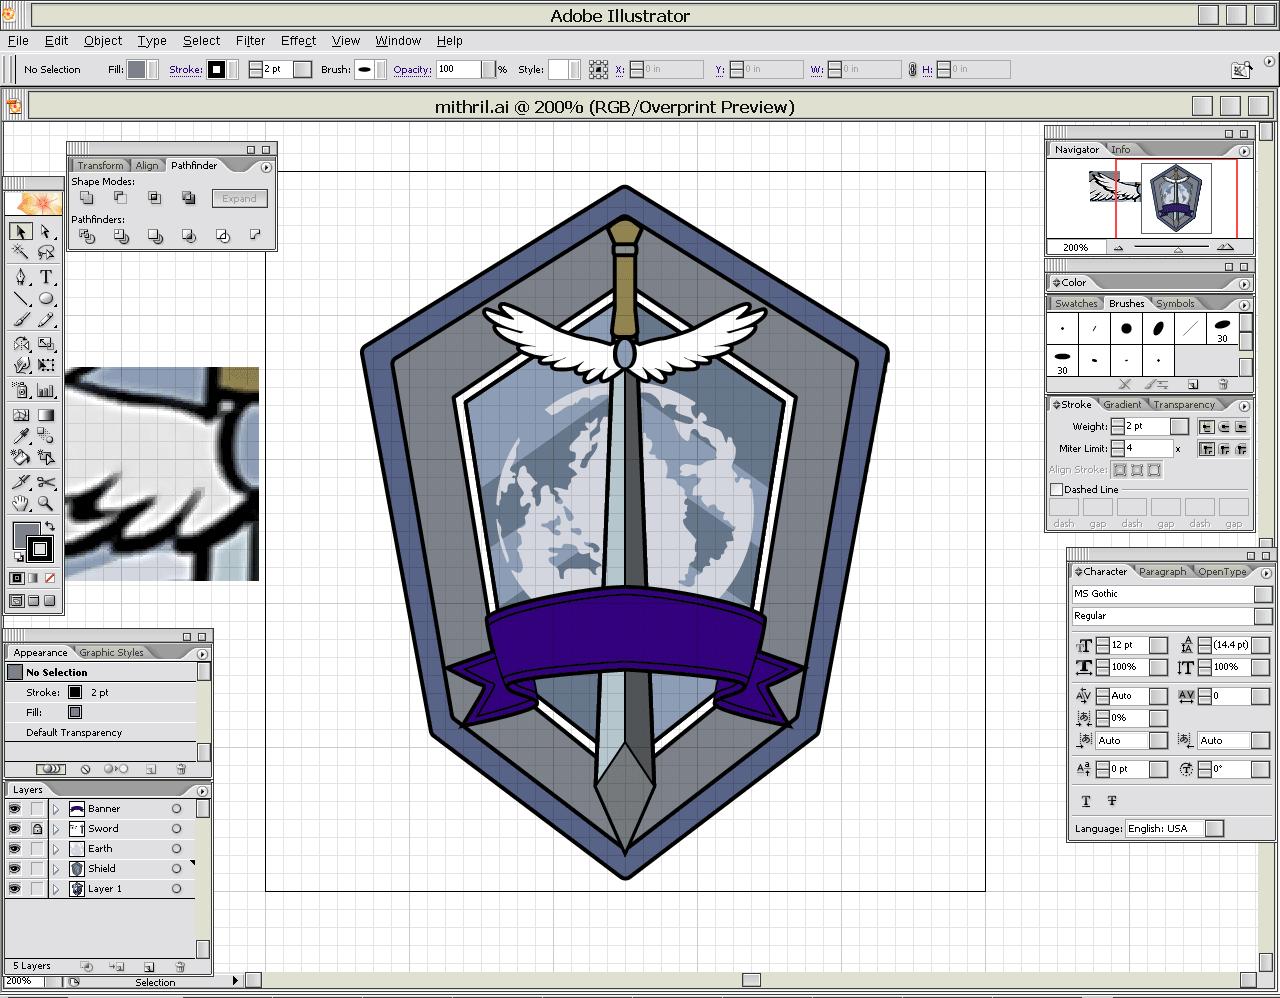 Working in Illustrator.